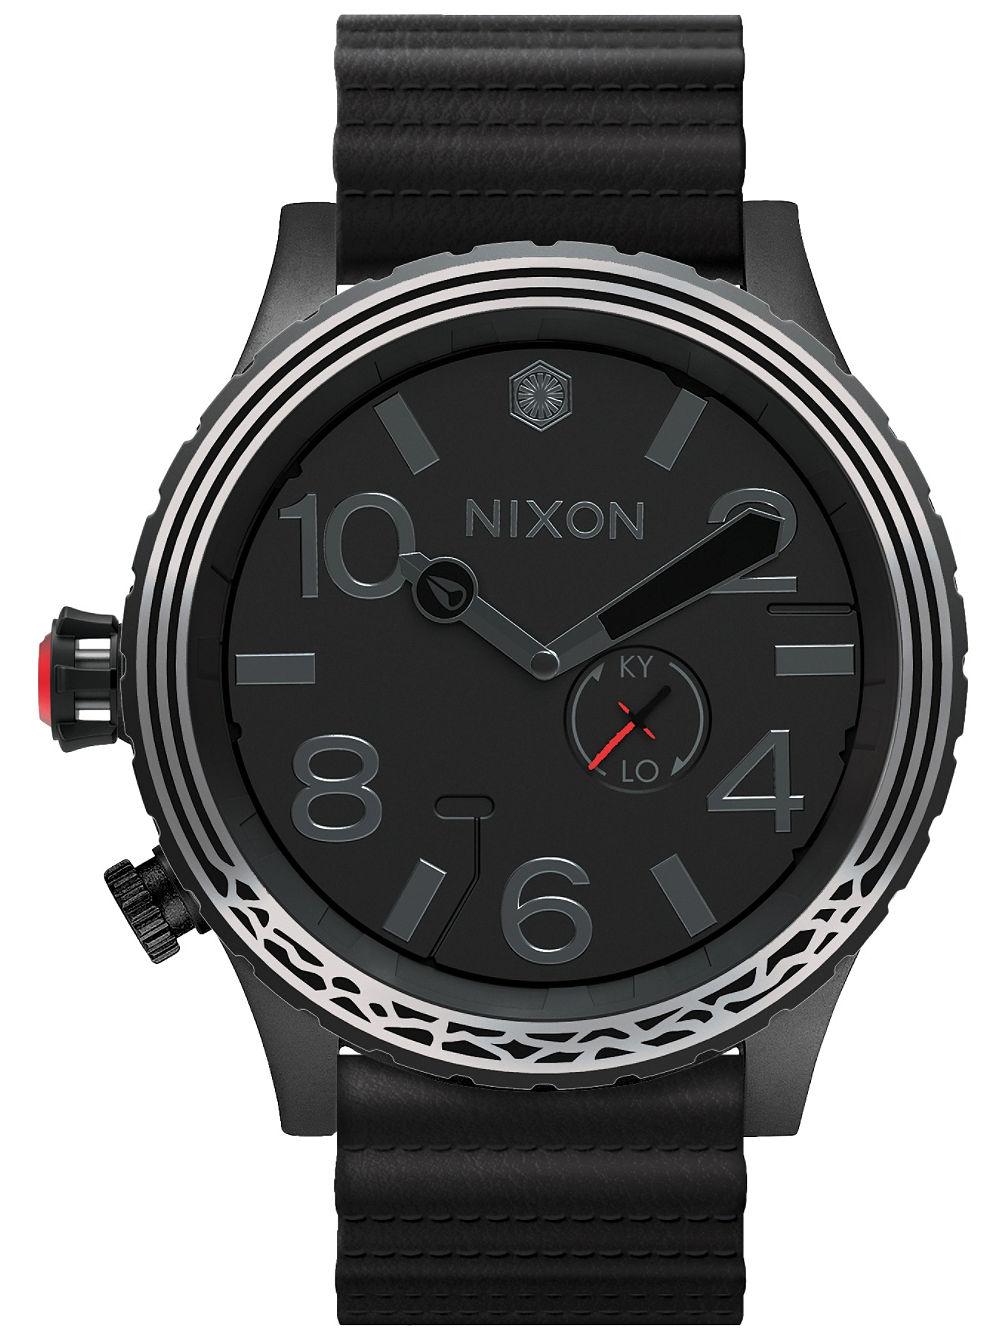 nixon the 51 30 leather star wars uhr online kaufen bei blue. Black Bedroom Furniture Sets. Home Design Ideas